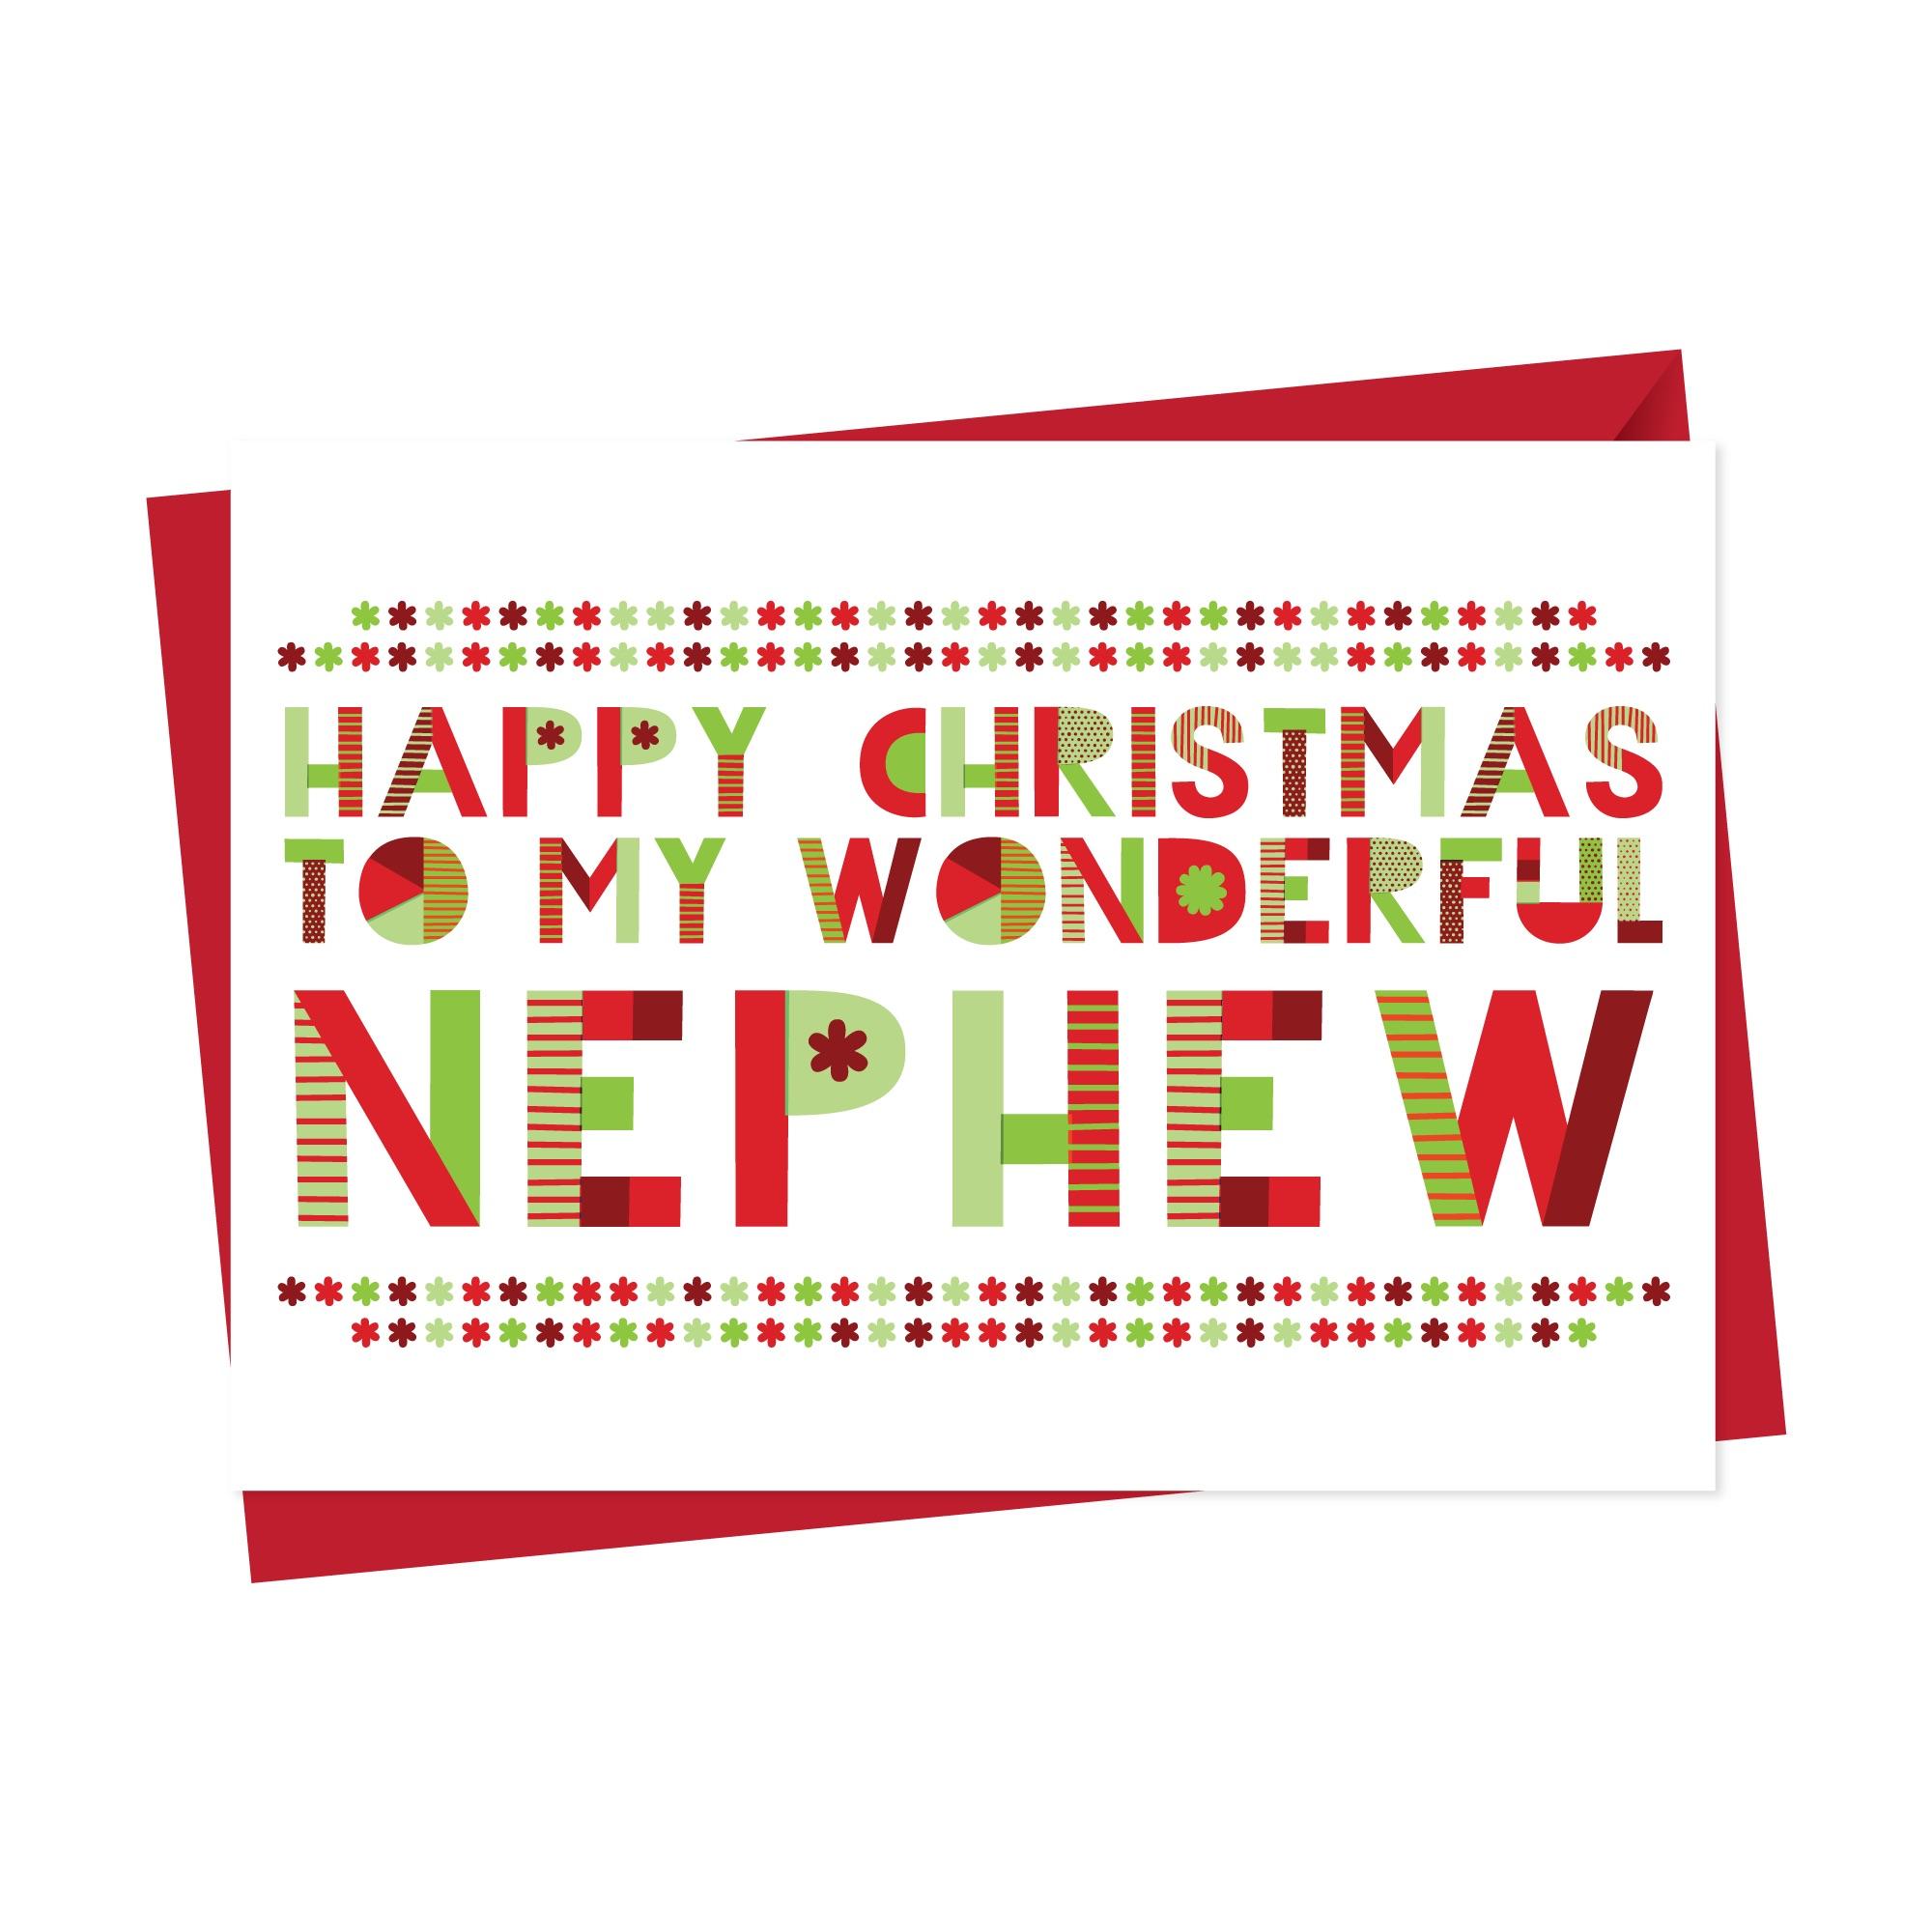 Wonderful Nephew Christmas Card